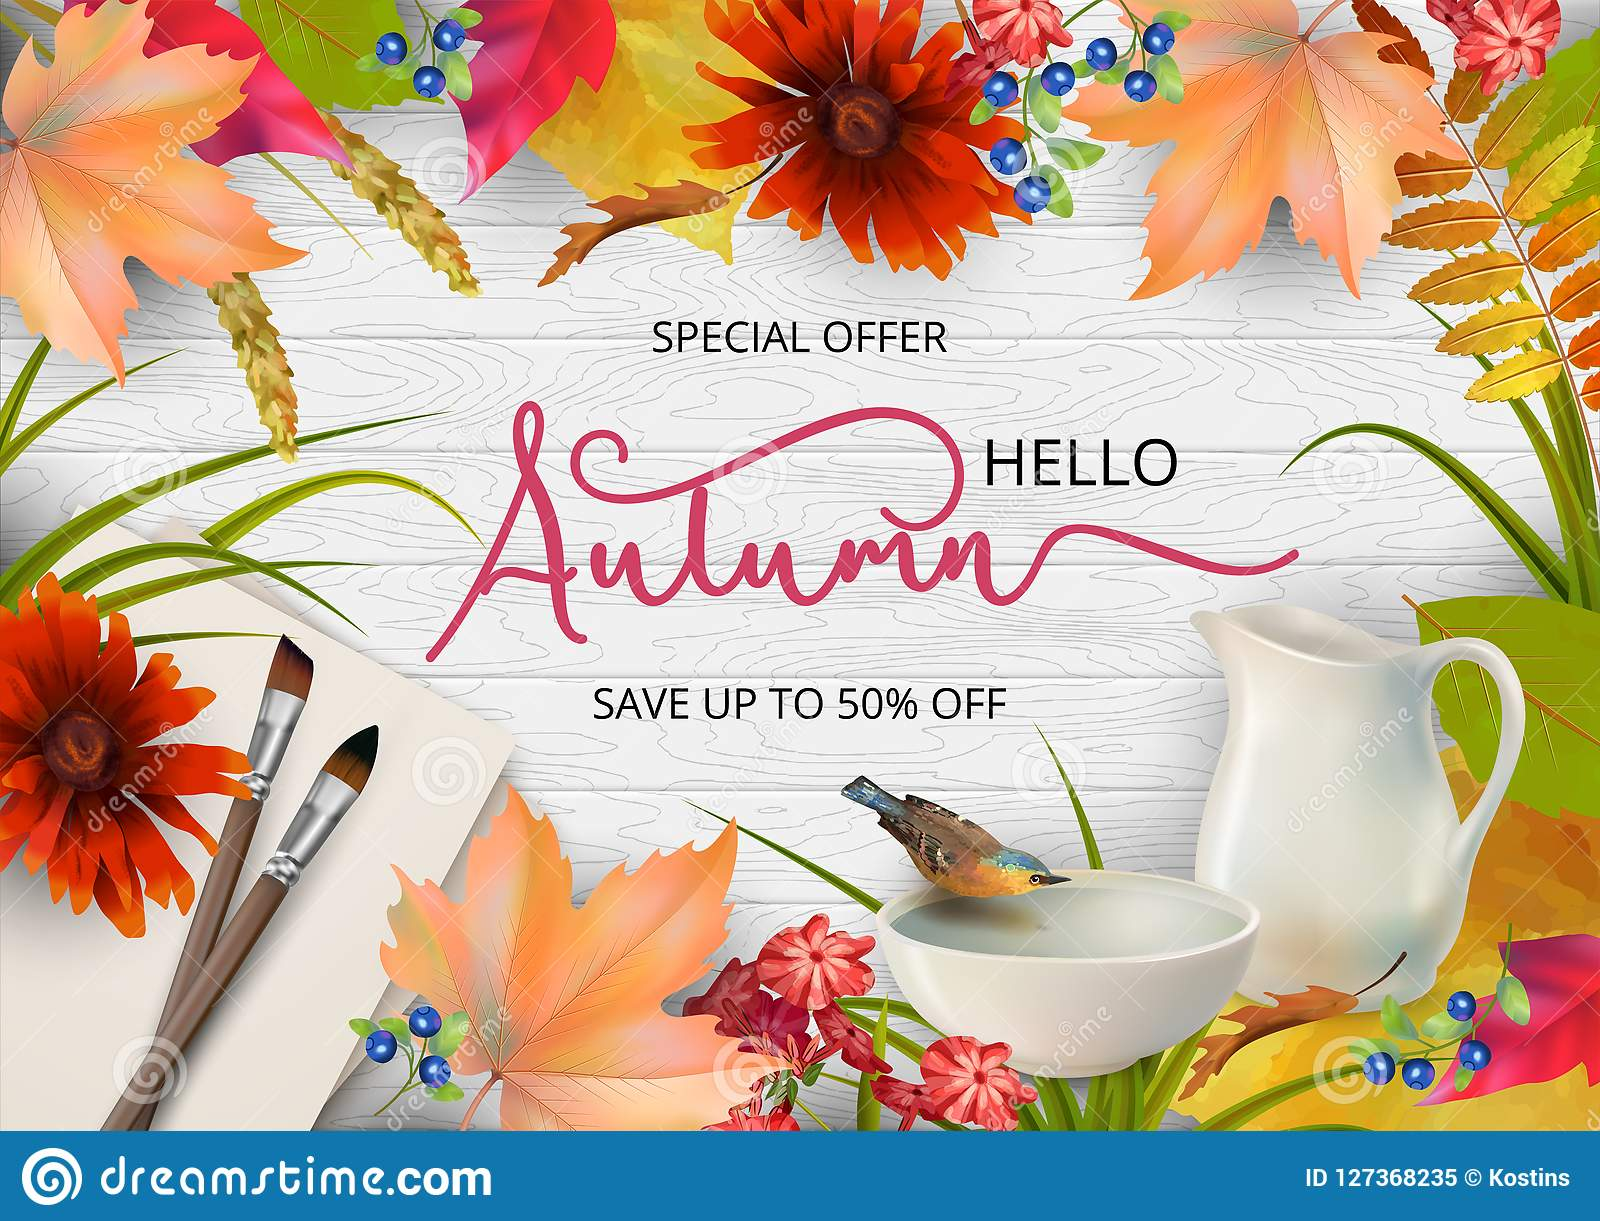 Autumn Advertising Banner